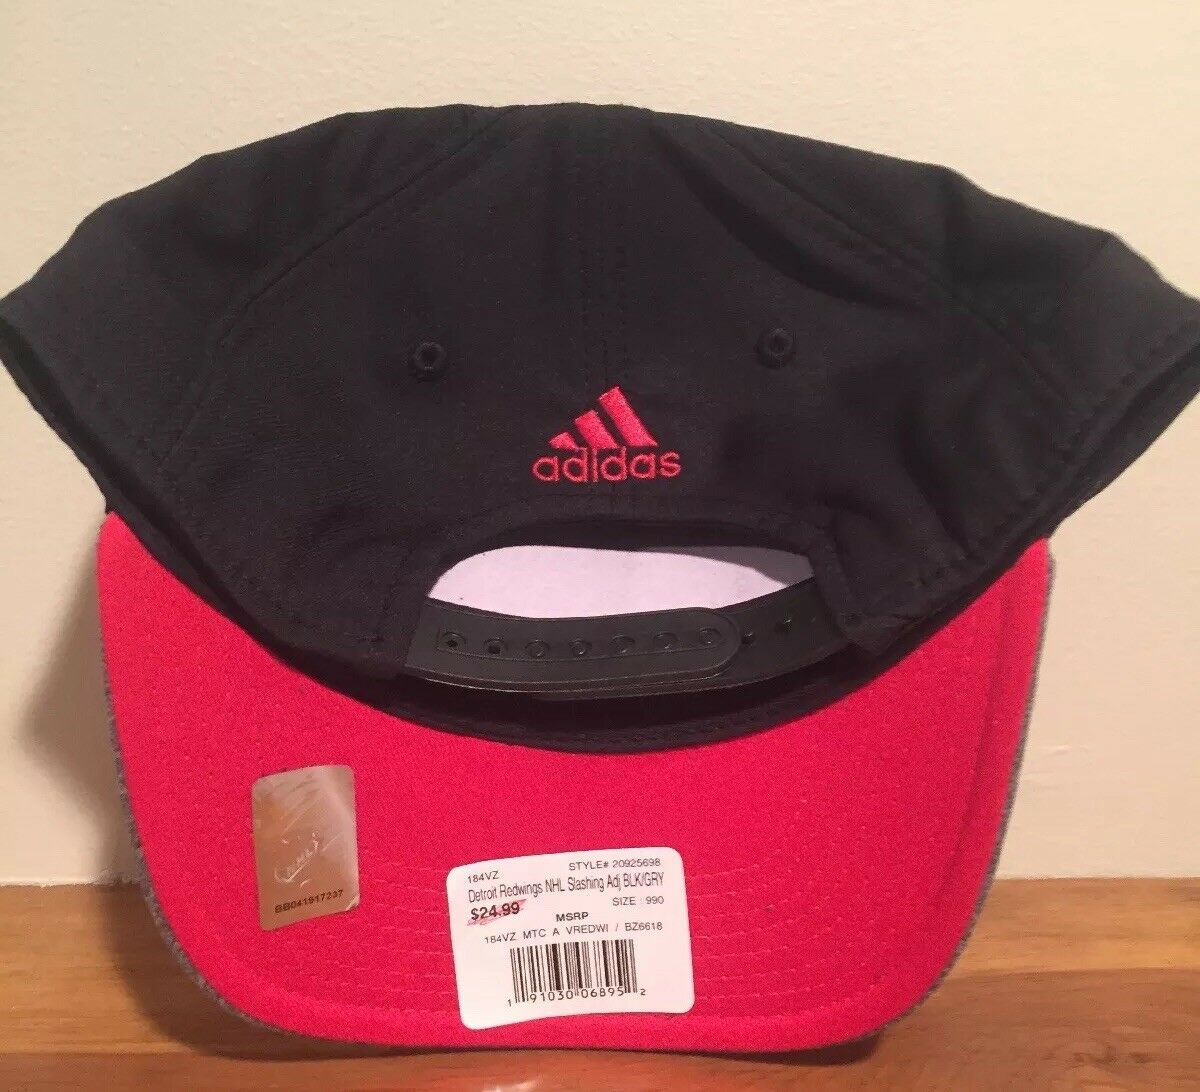 cheap for discount f73ca 14b7c ... good promo code for detroit red wings nhl adidas slashing snapback hat  cap ebay 2fb59 0bc0e